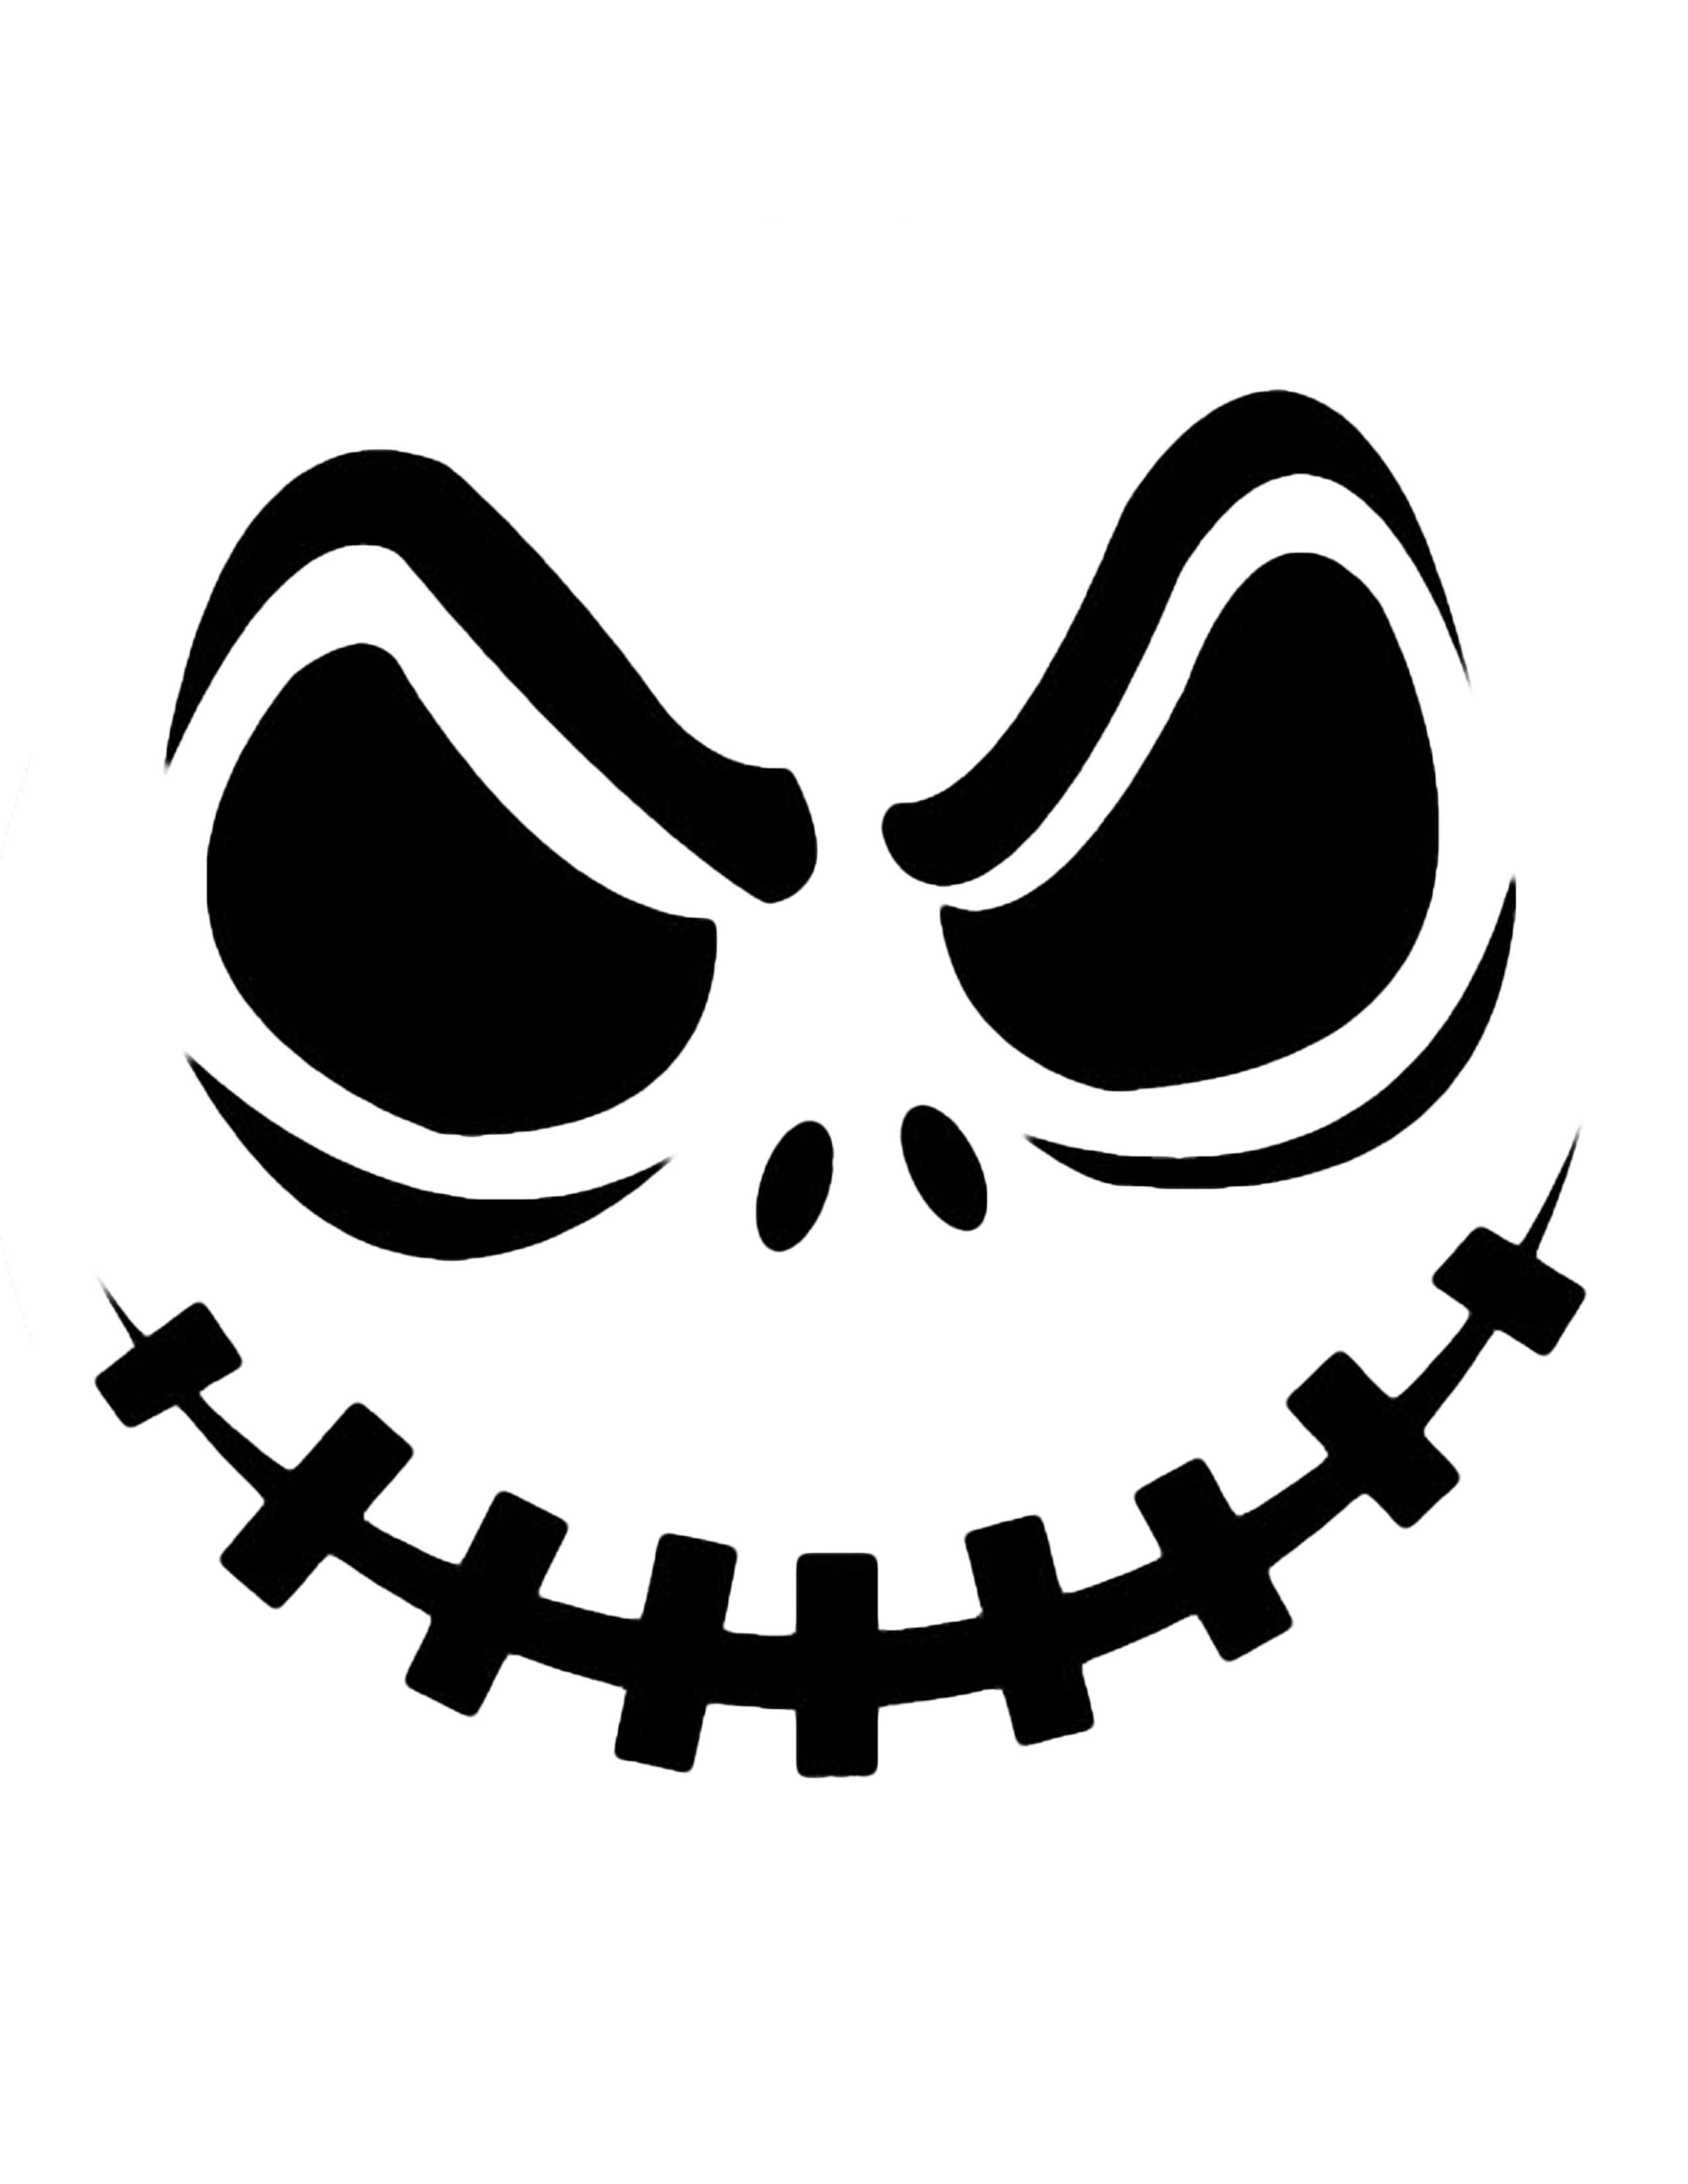 Jack Skellington Pumpkin   Cricut Cutter Ideas   Halloween, Pumpkin - Free Printable Scary Pumpkin Patterns